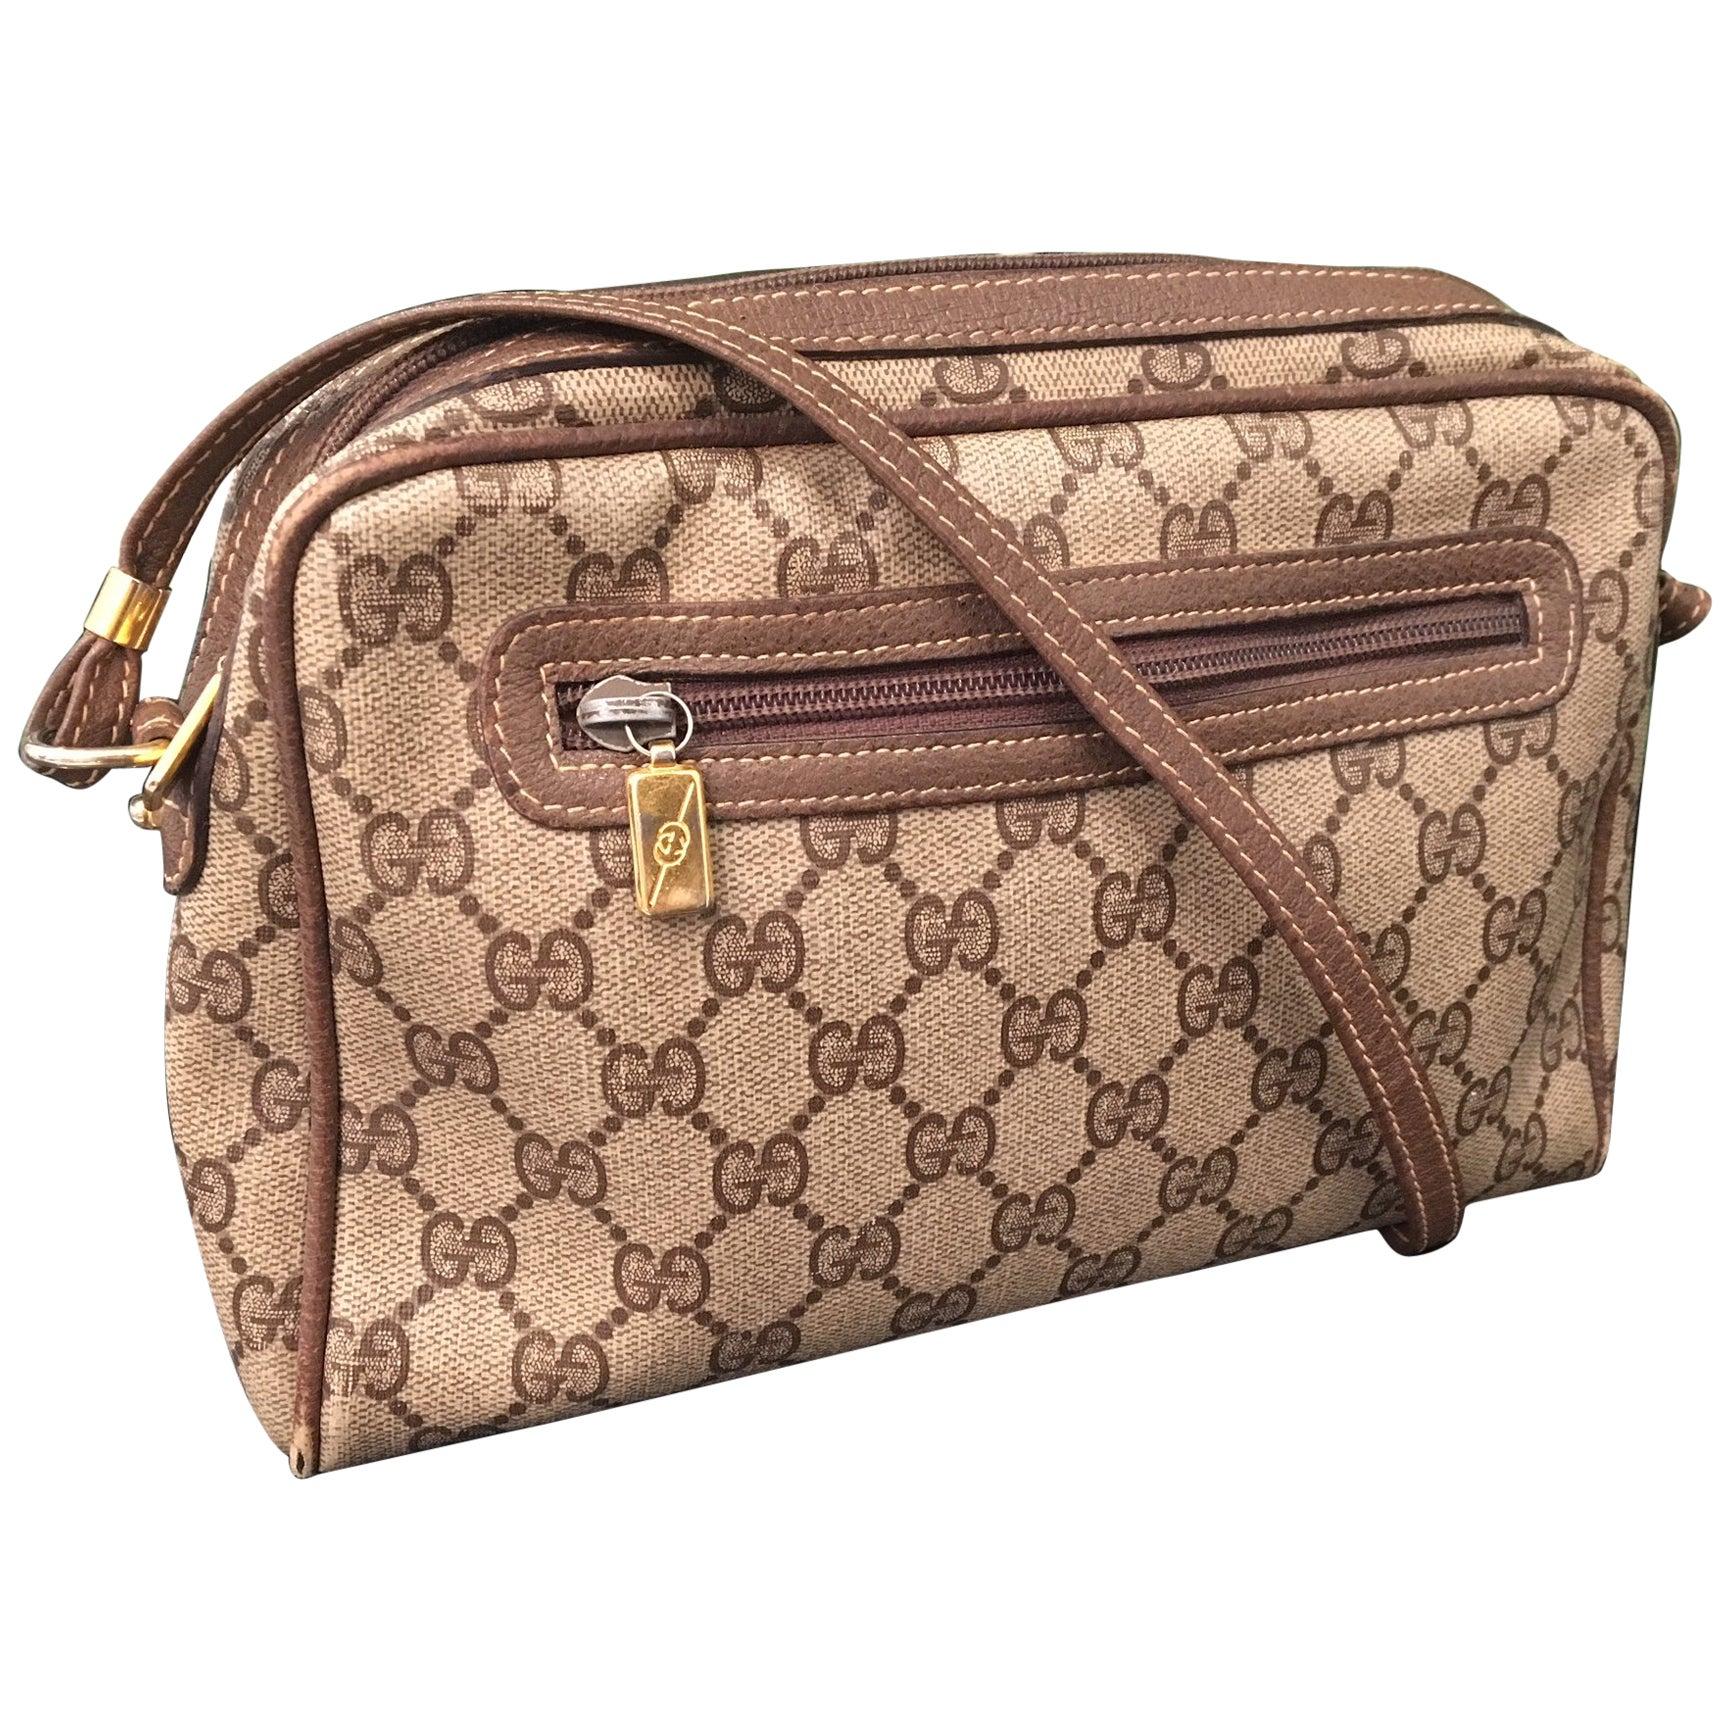 "Vintage Signature ""GG"" Monogram Crossbody Handbag"